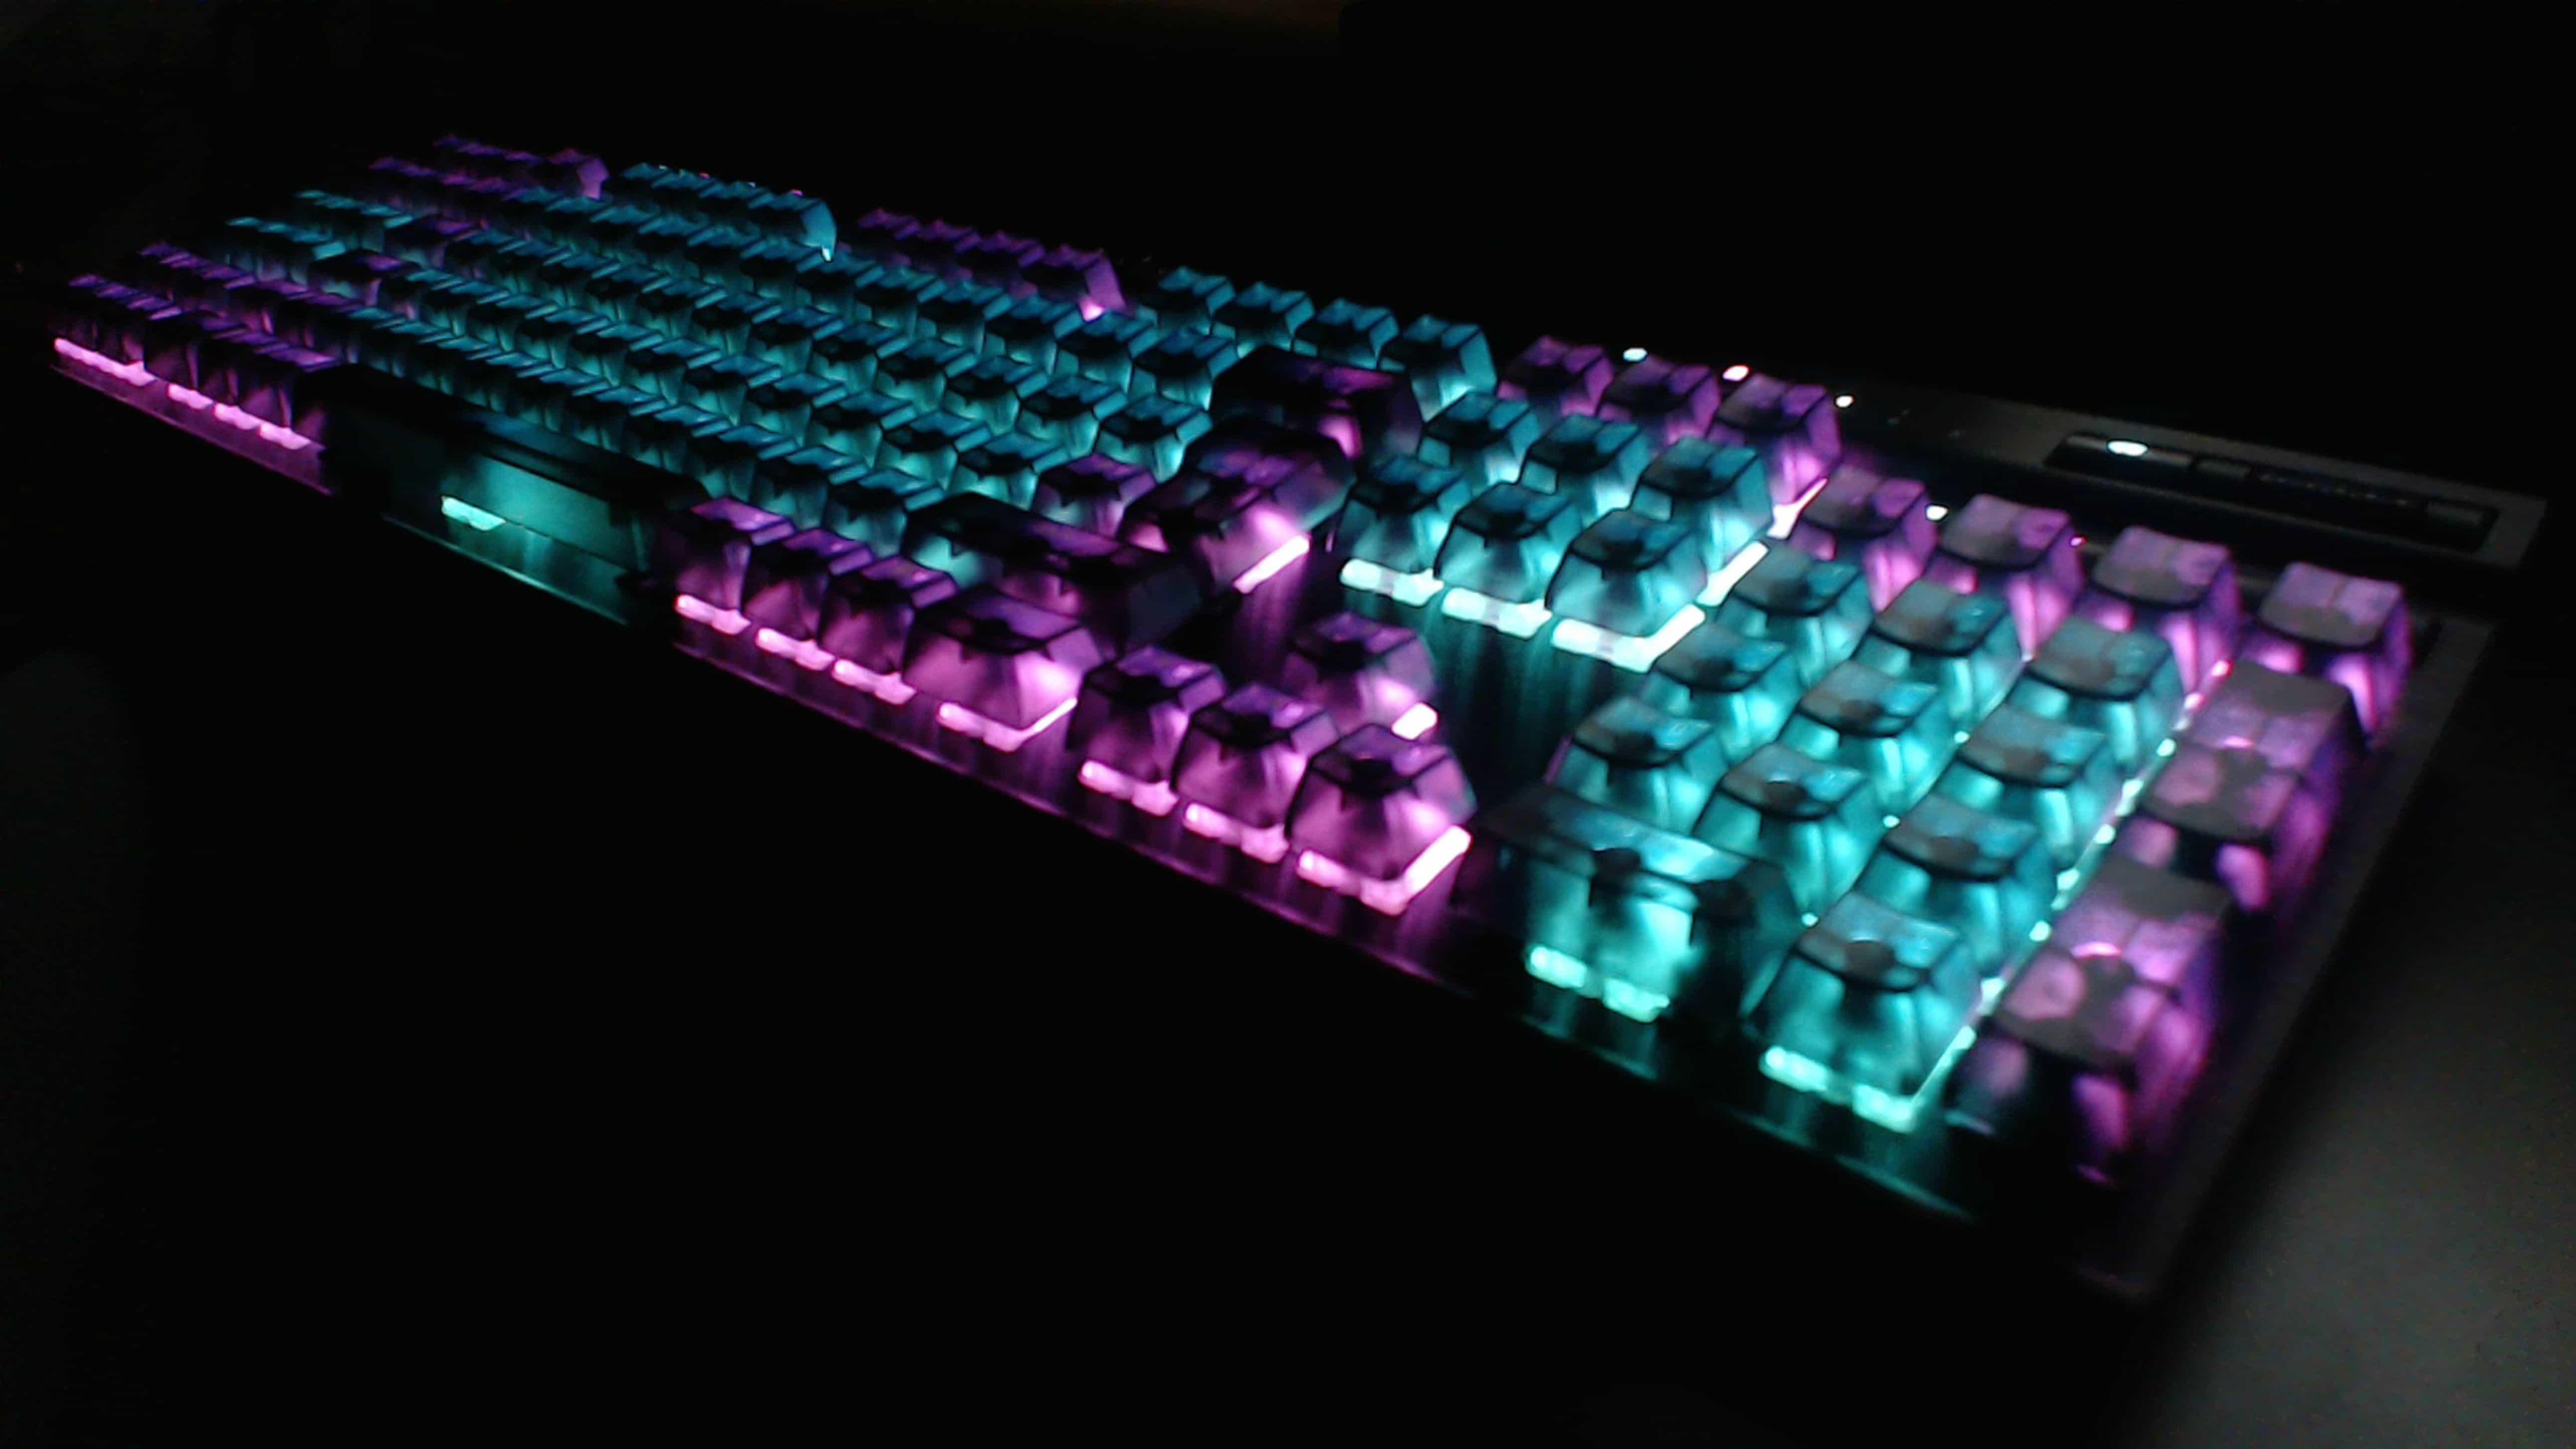 Corsair K95 RGB – mechanical keyboard